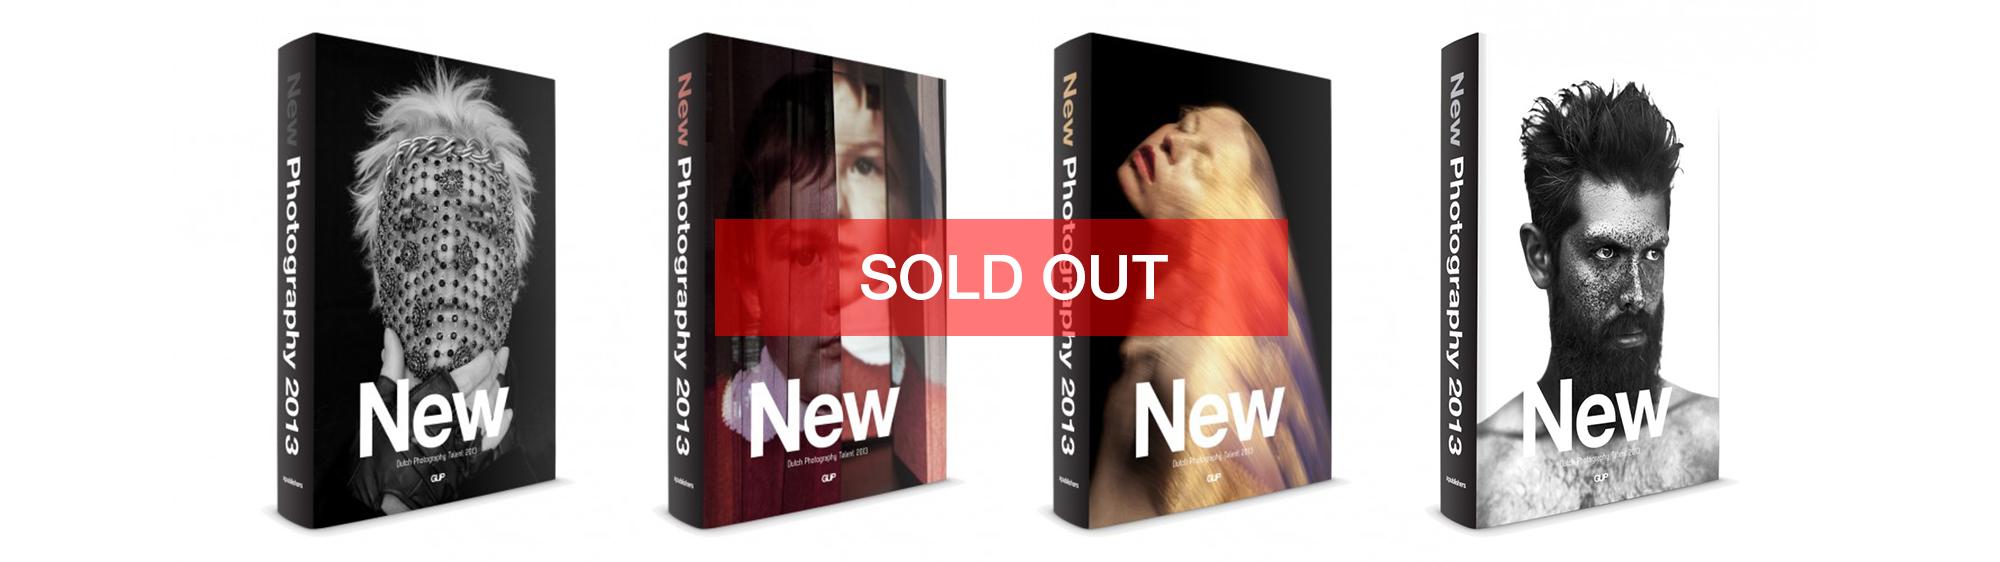 Foreword by Frits Gierstberg  Cover images © Michiel Meewis / Hester Dekker / Dimitri Valentijn / Micky Hoogendijk